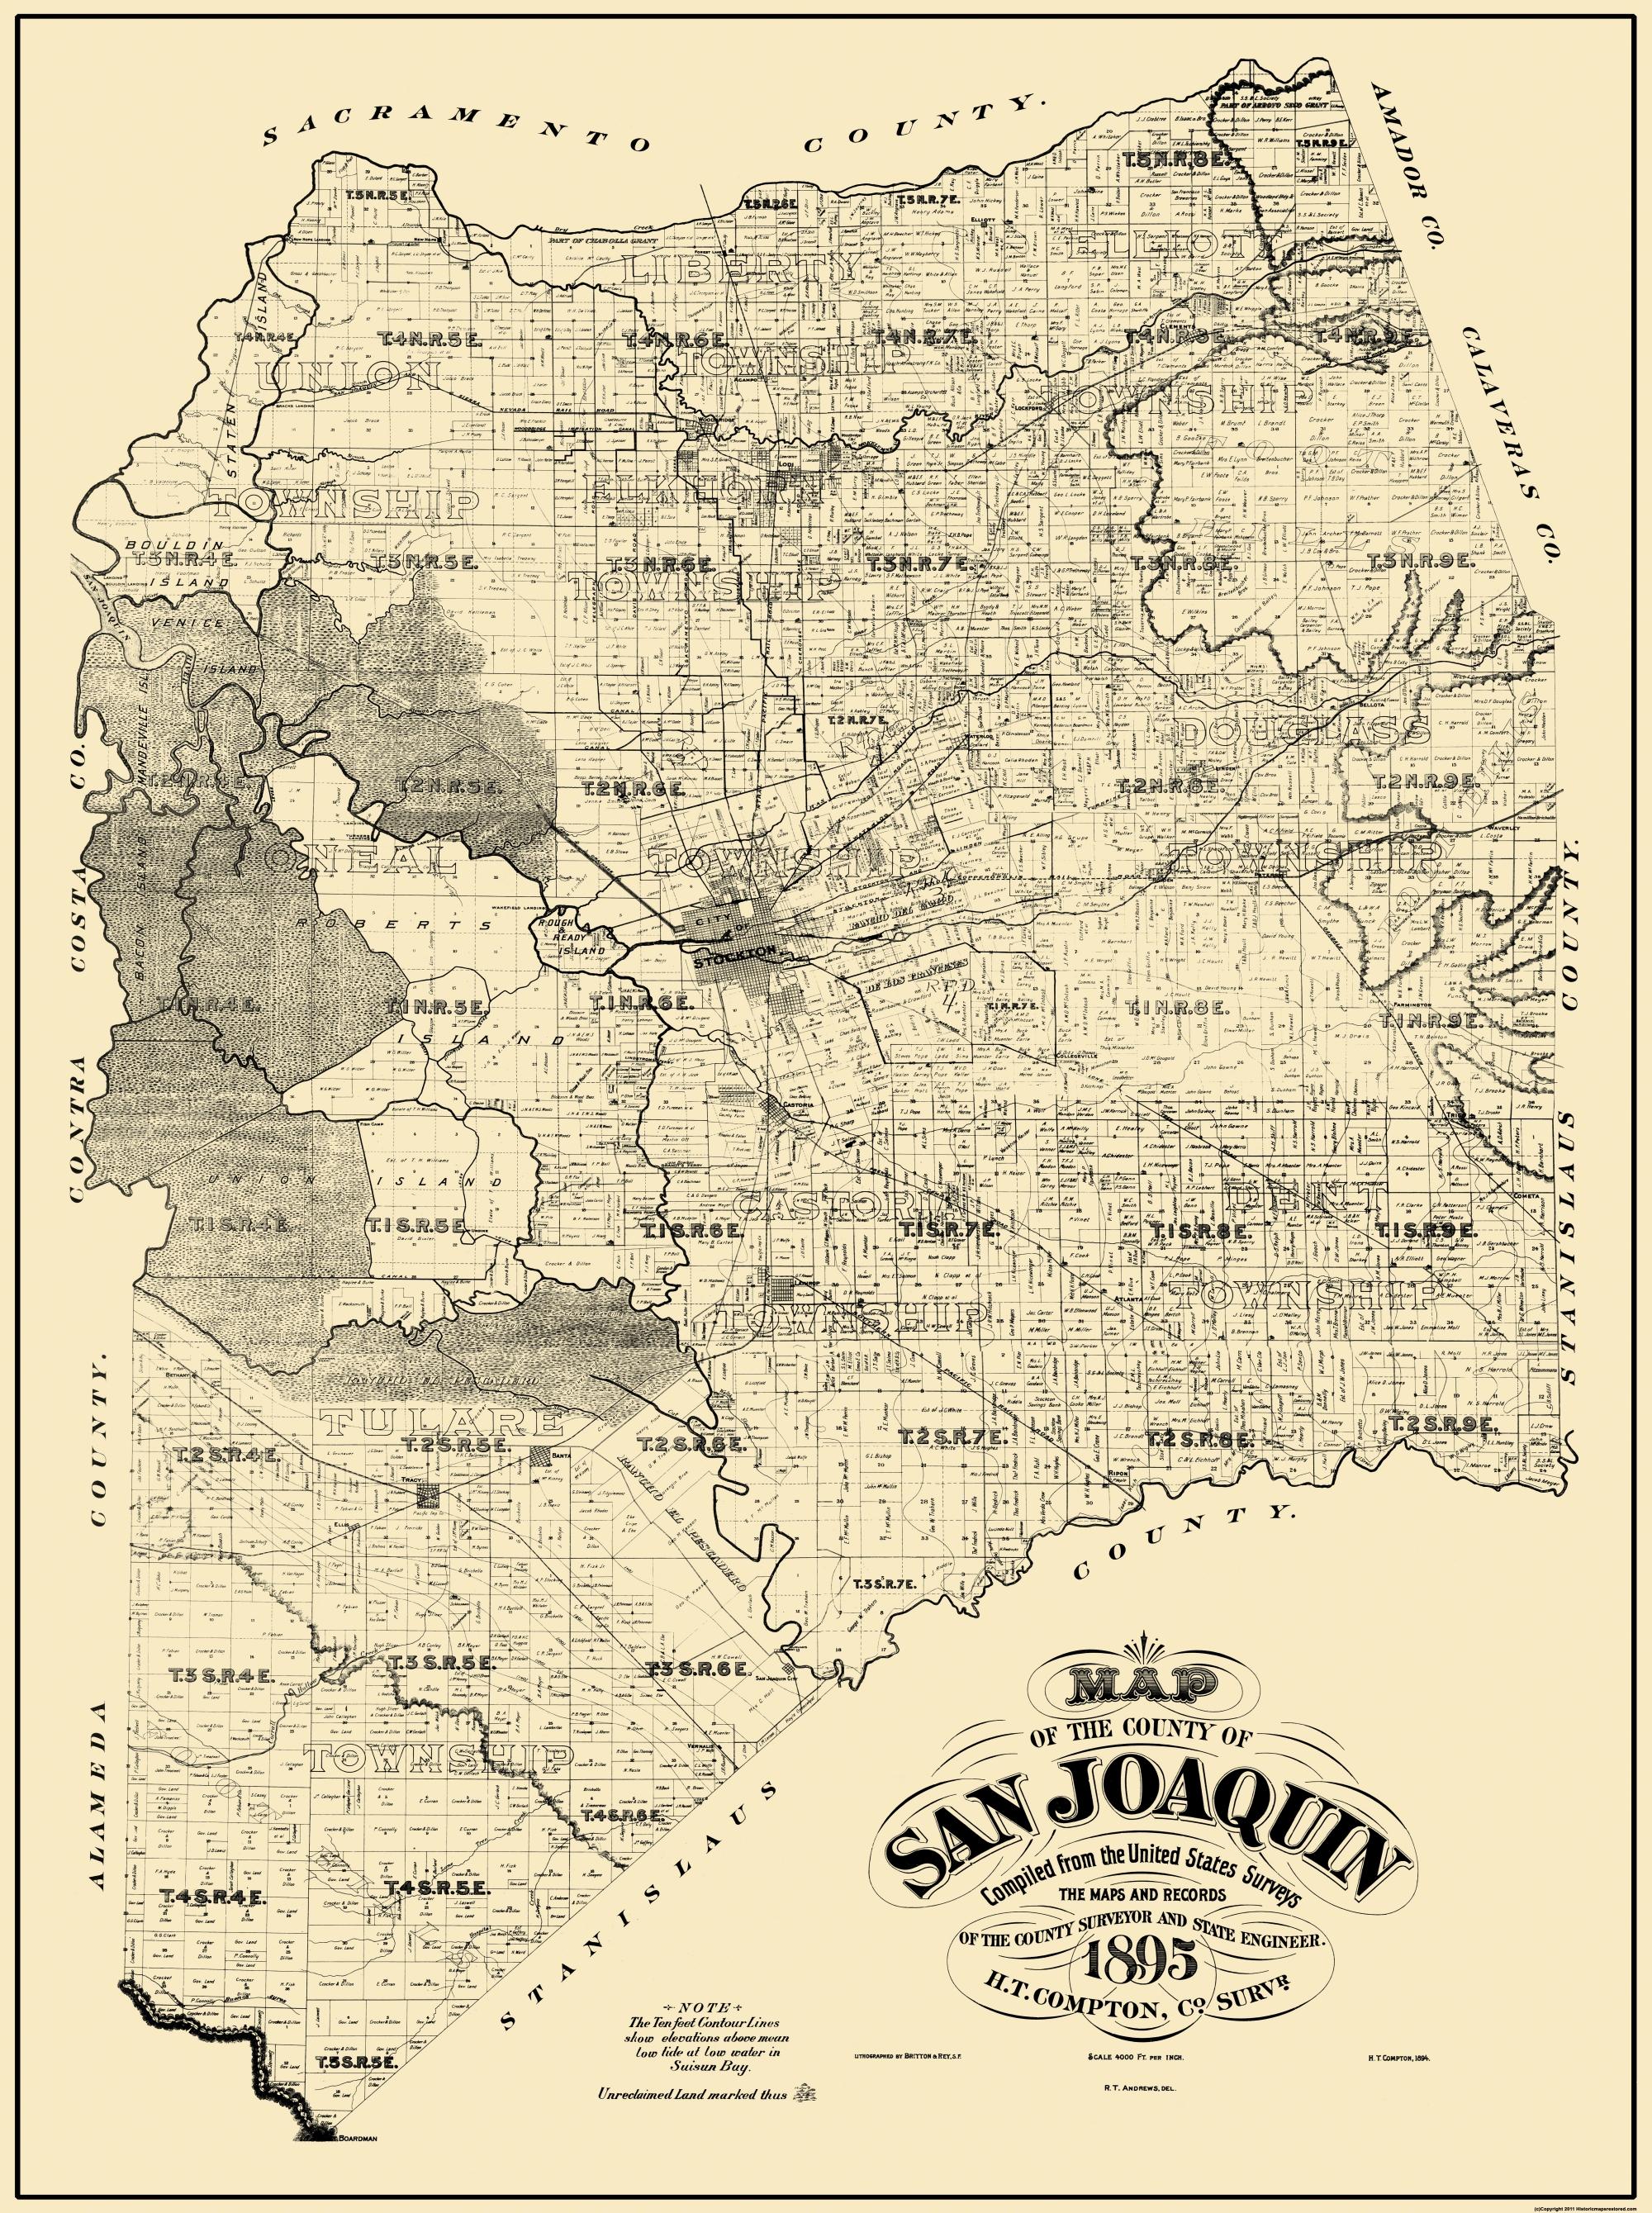 Old County Map San Joaquin California Landowner 1895